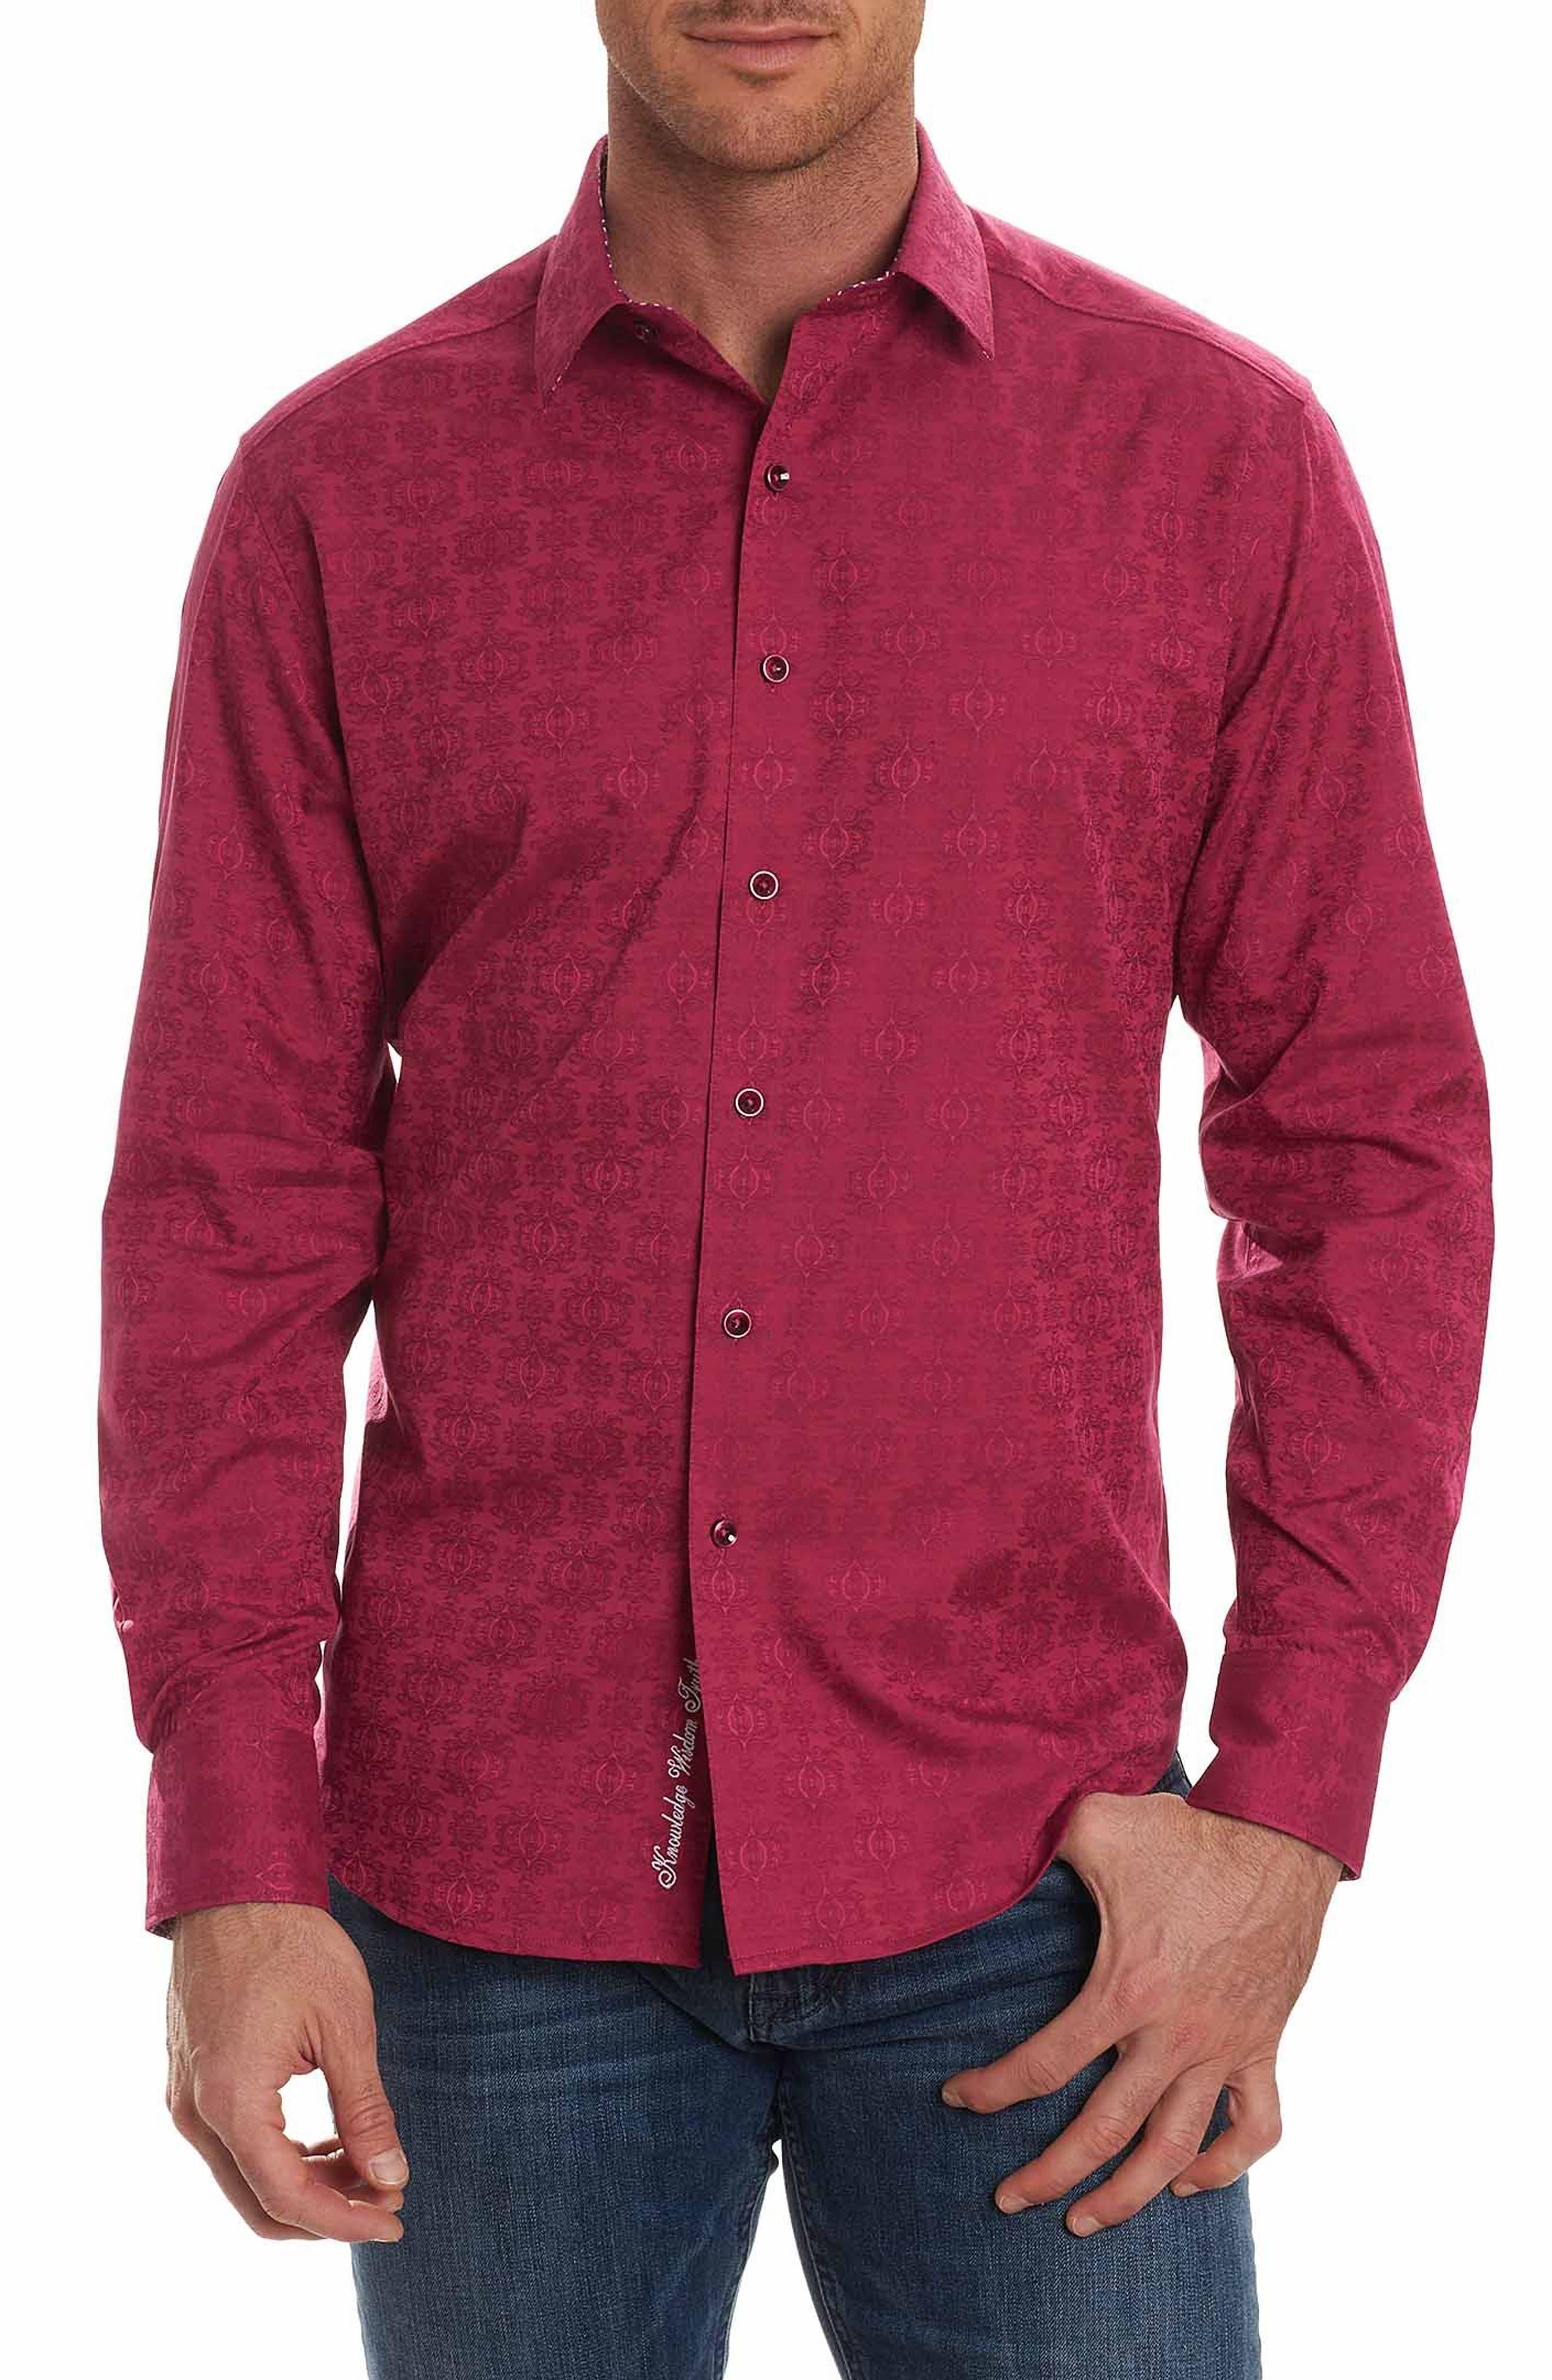 Cullen Classic Fit Jacquard Sport Shirt,                             Main thumbnail 1, color,                             Rose